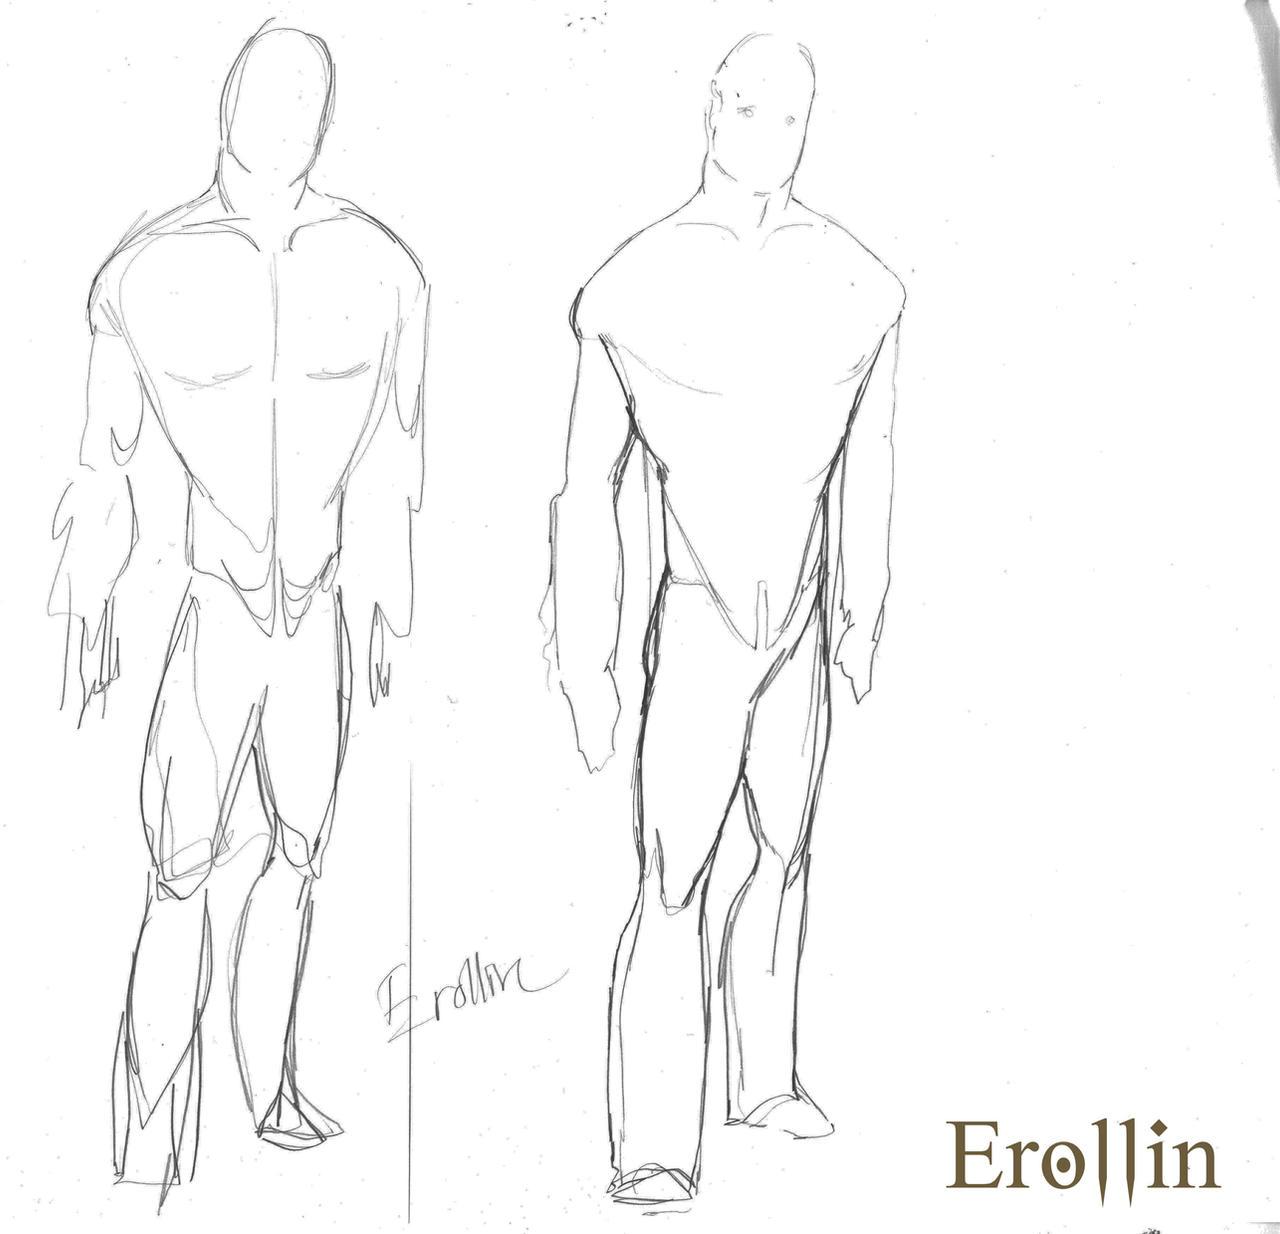 Erollin - conceptual stance